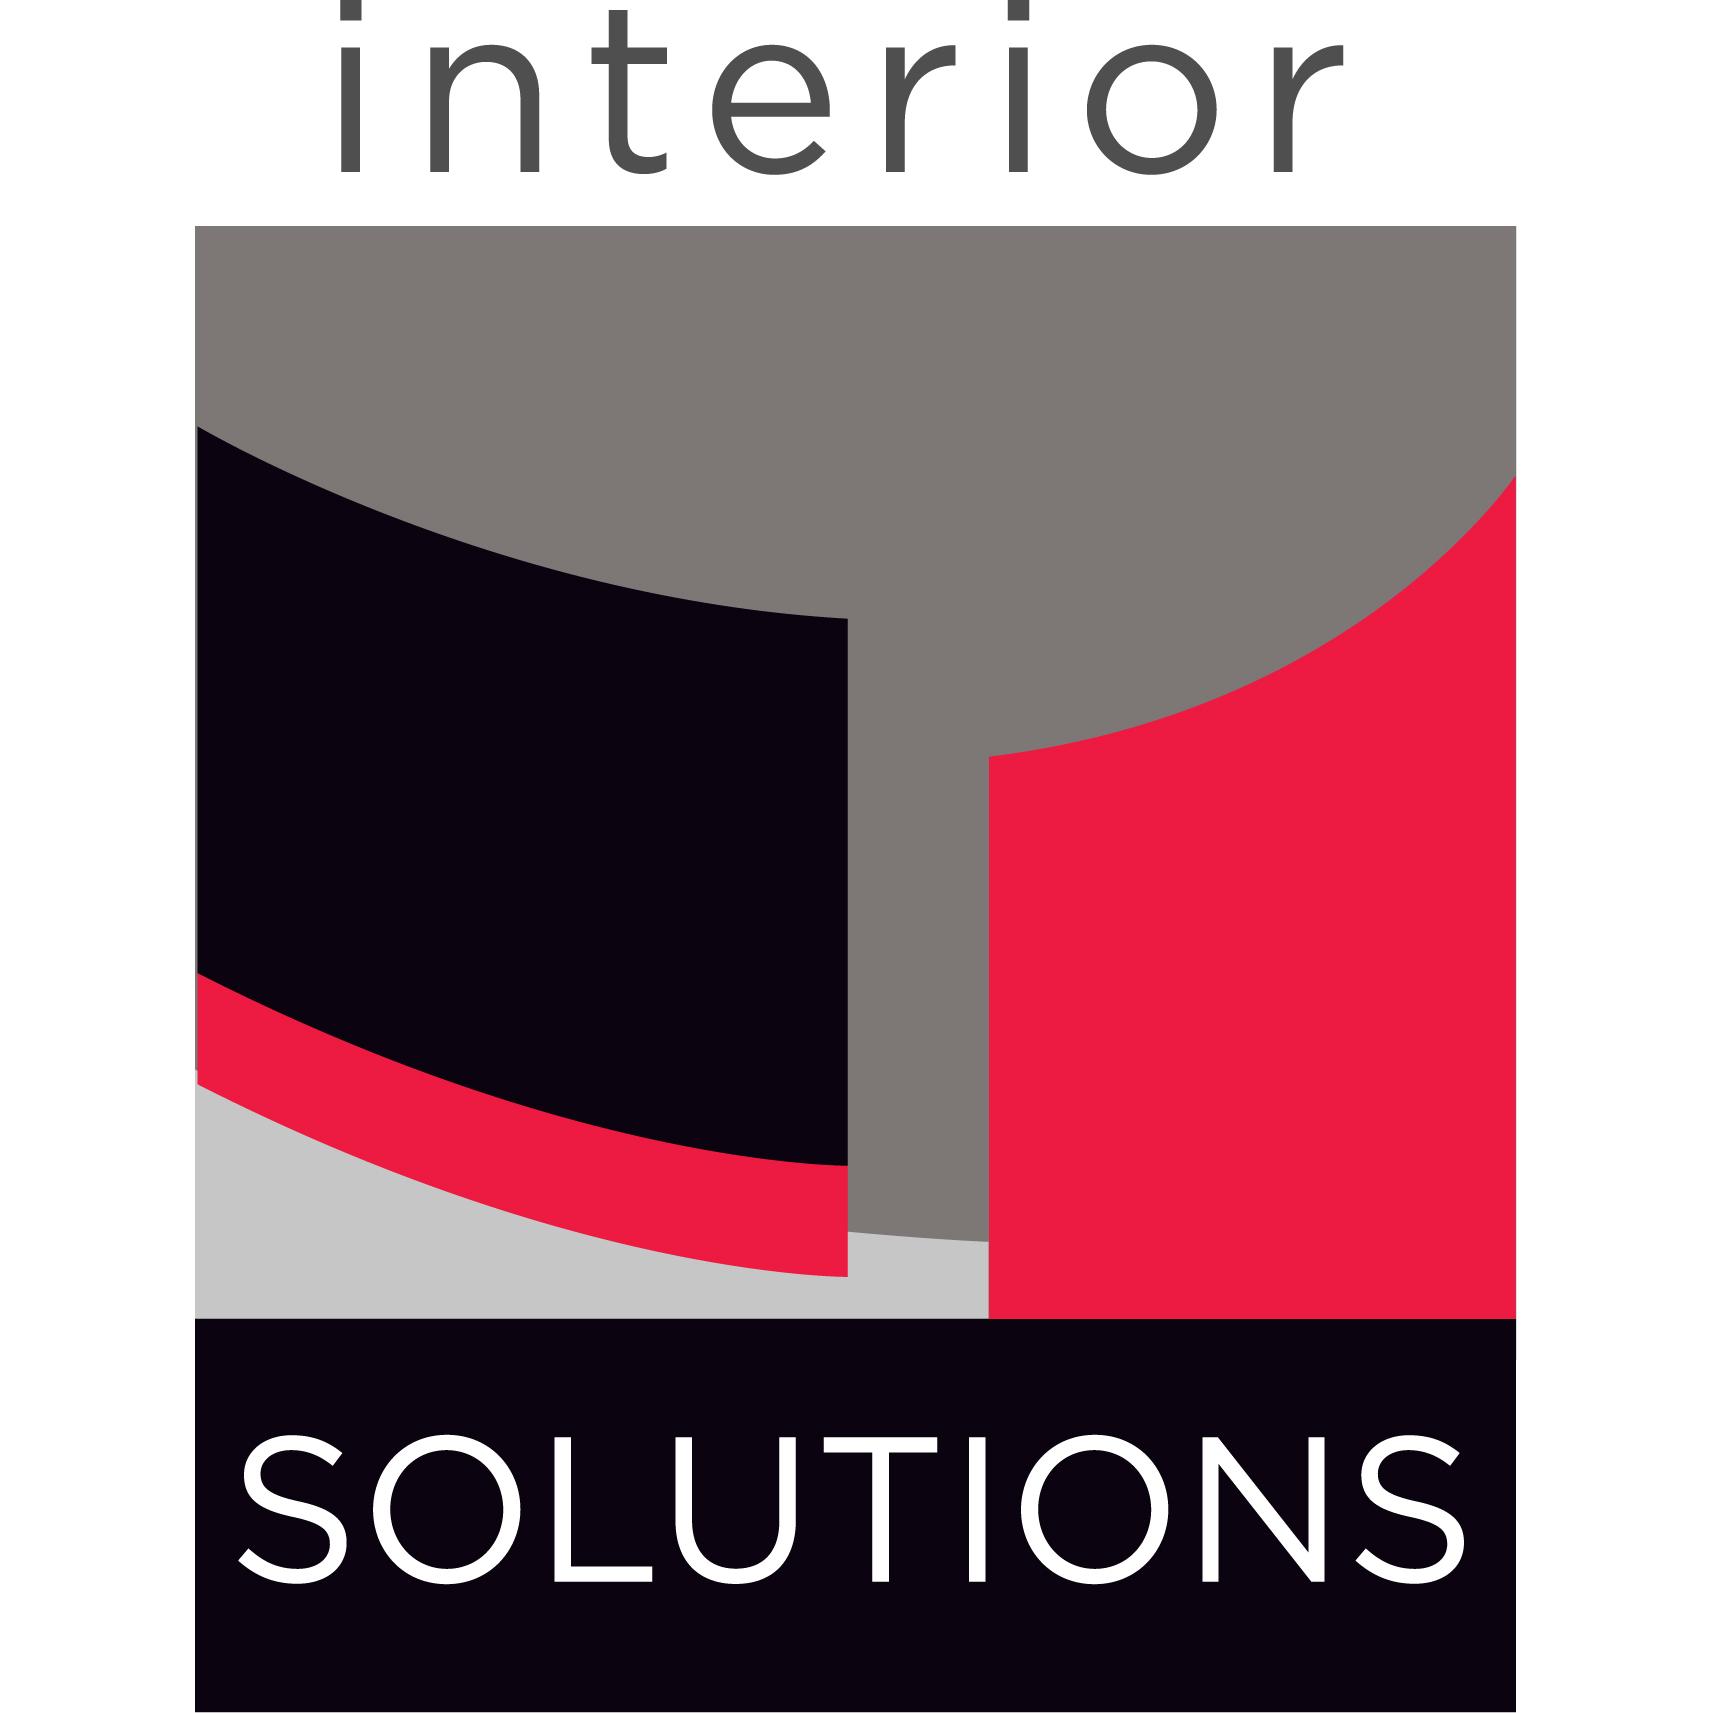 Interior solutions in salt lake city ut 84101 for Interior solutions